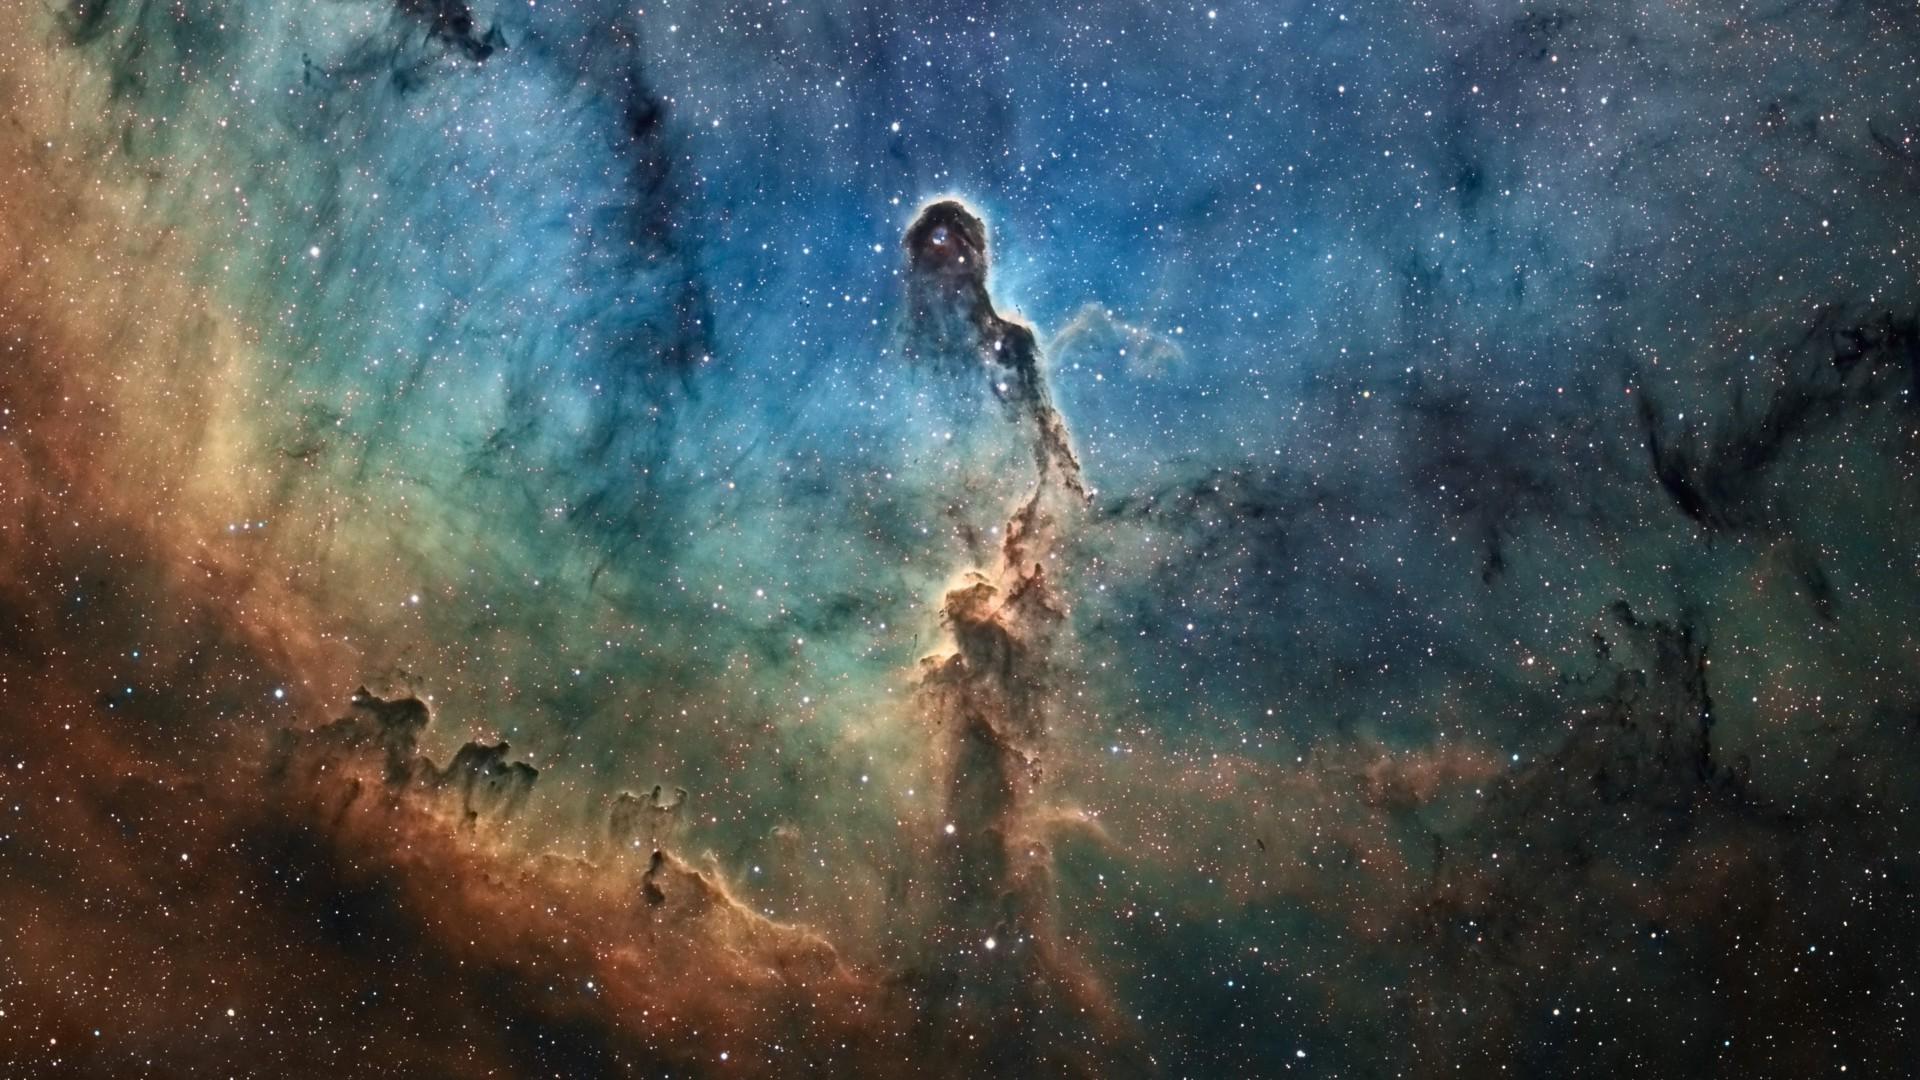 Gravity Falls Ios Wallpaper Wallpaper 1920x1080 Px Galaxy Nasa Space 1920x1080